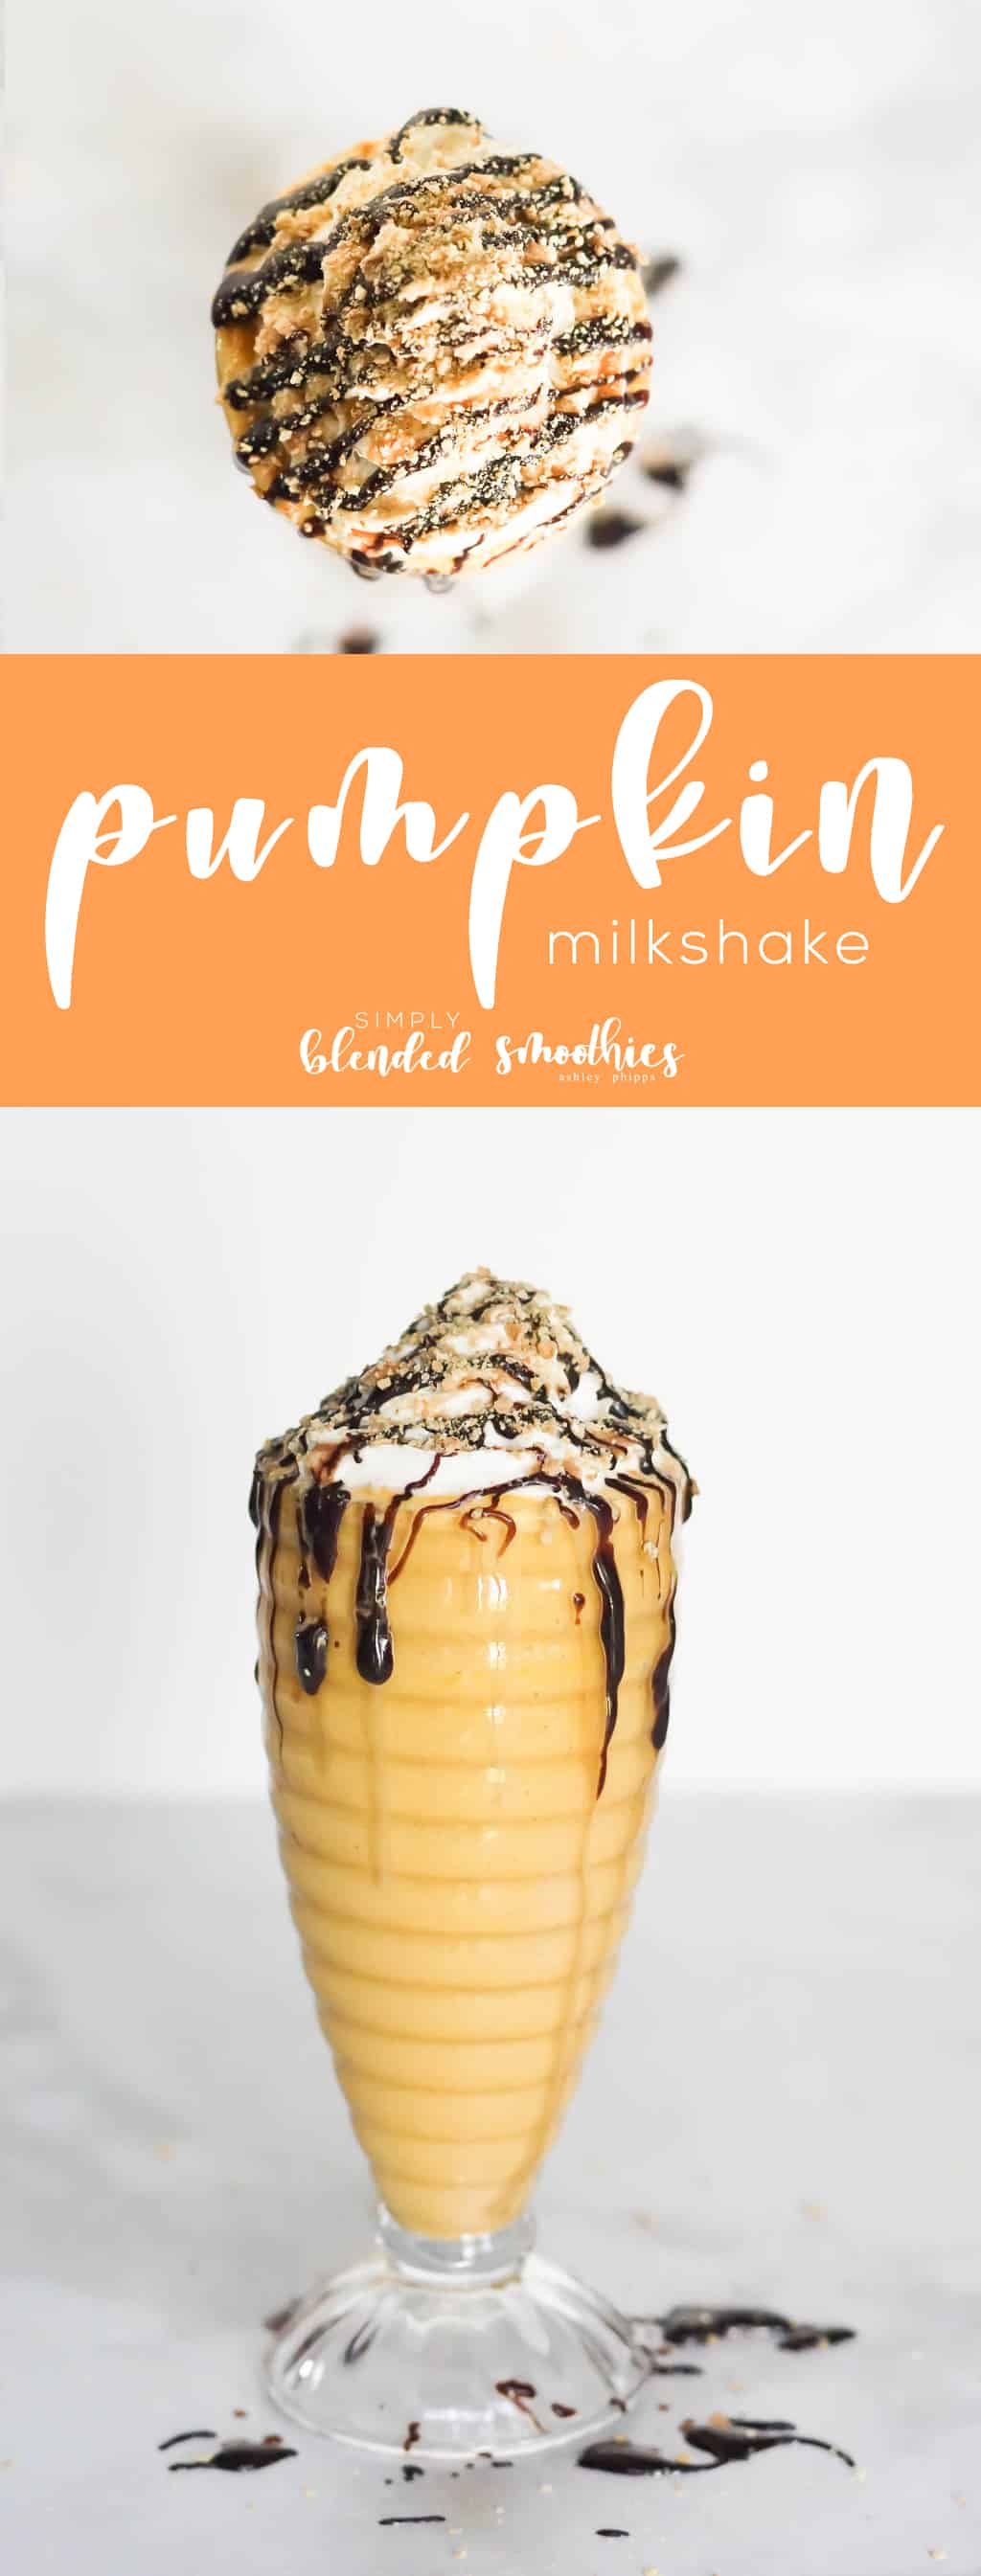 Pumpkin Milkshake Recipe - This Pumpkin Milkshake Recipe Is So Delicious